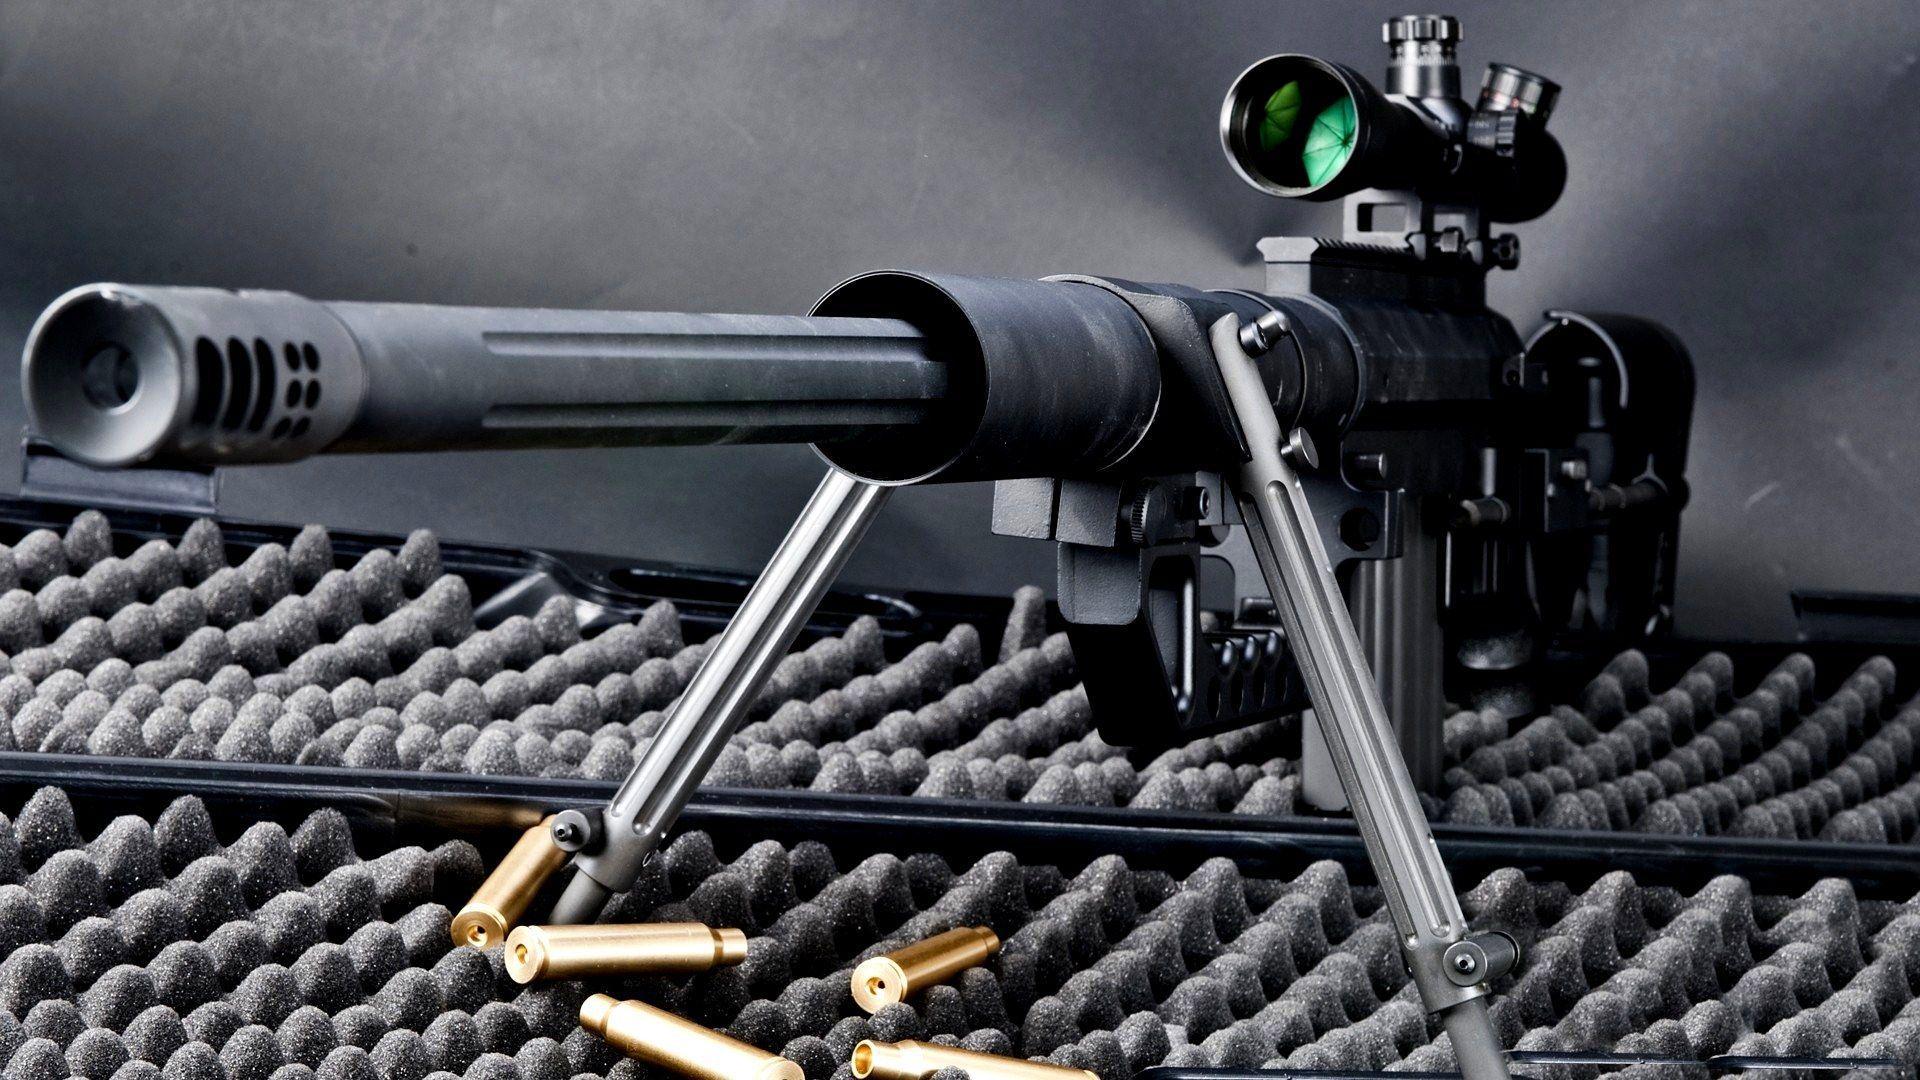 13 HD Sniper Rifle Guns Wallpapers |Sniper Rifle Wallpaper